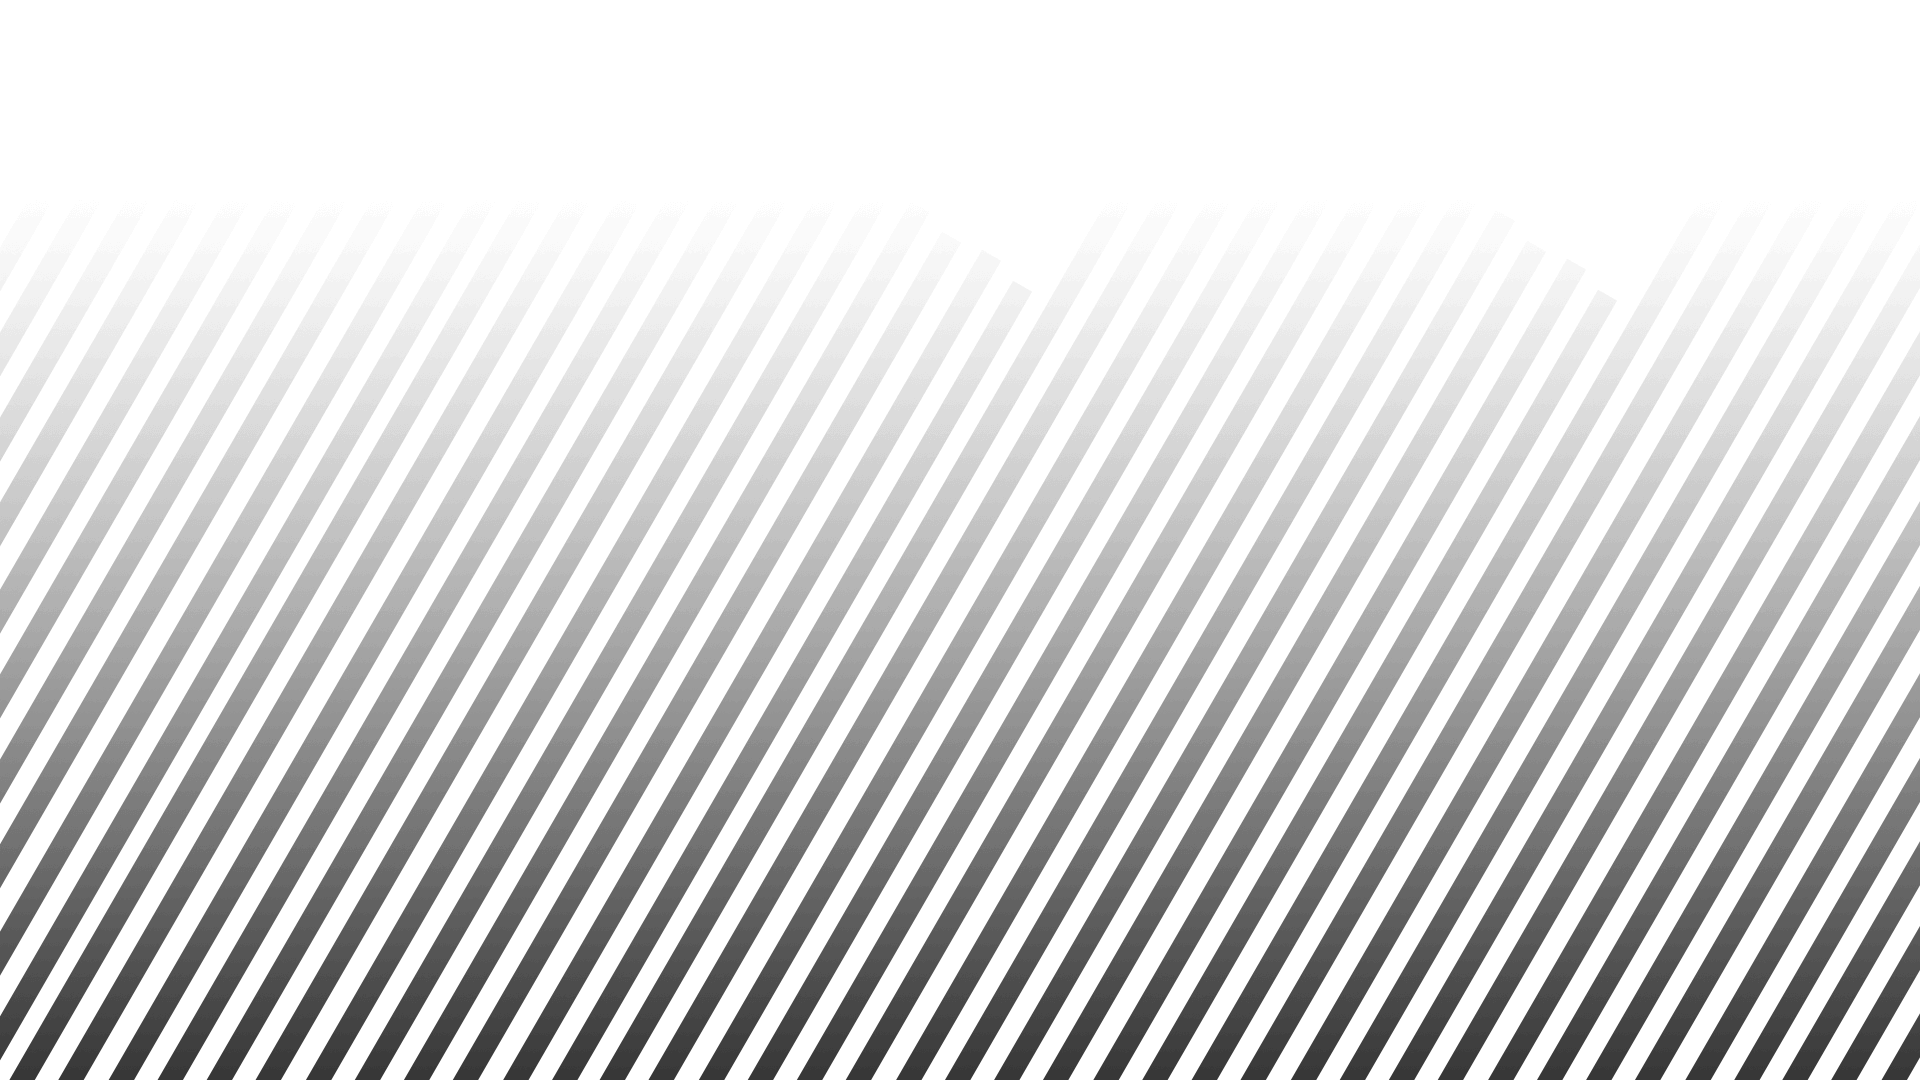 achtegrond